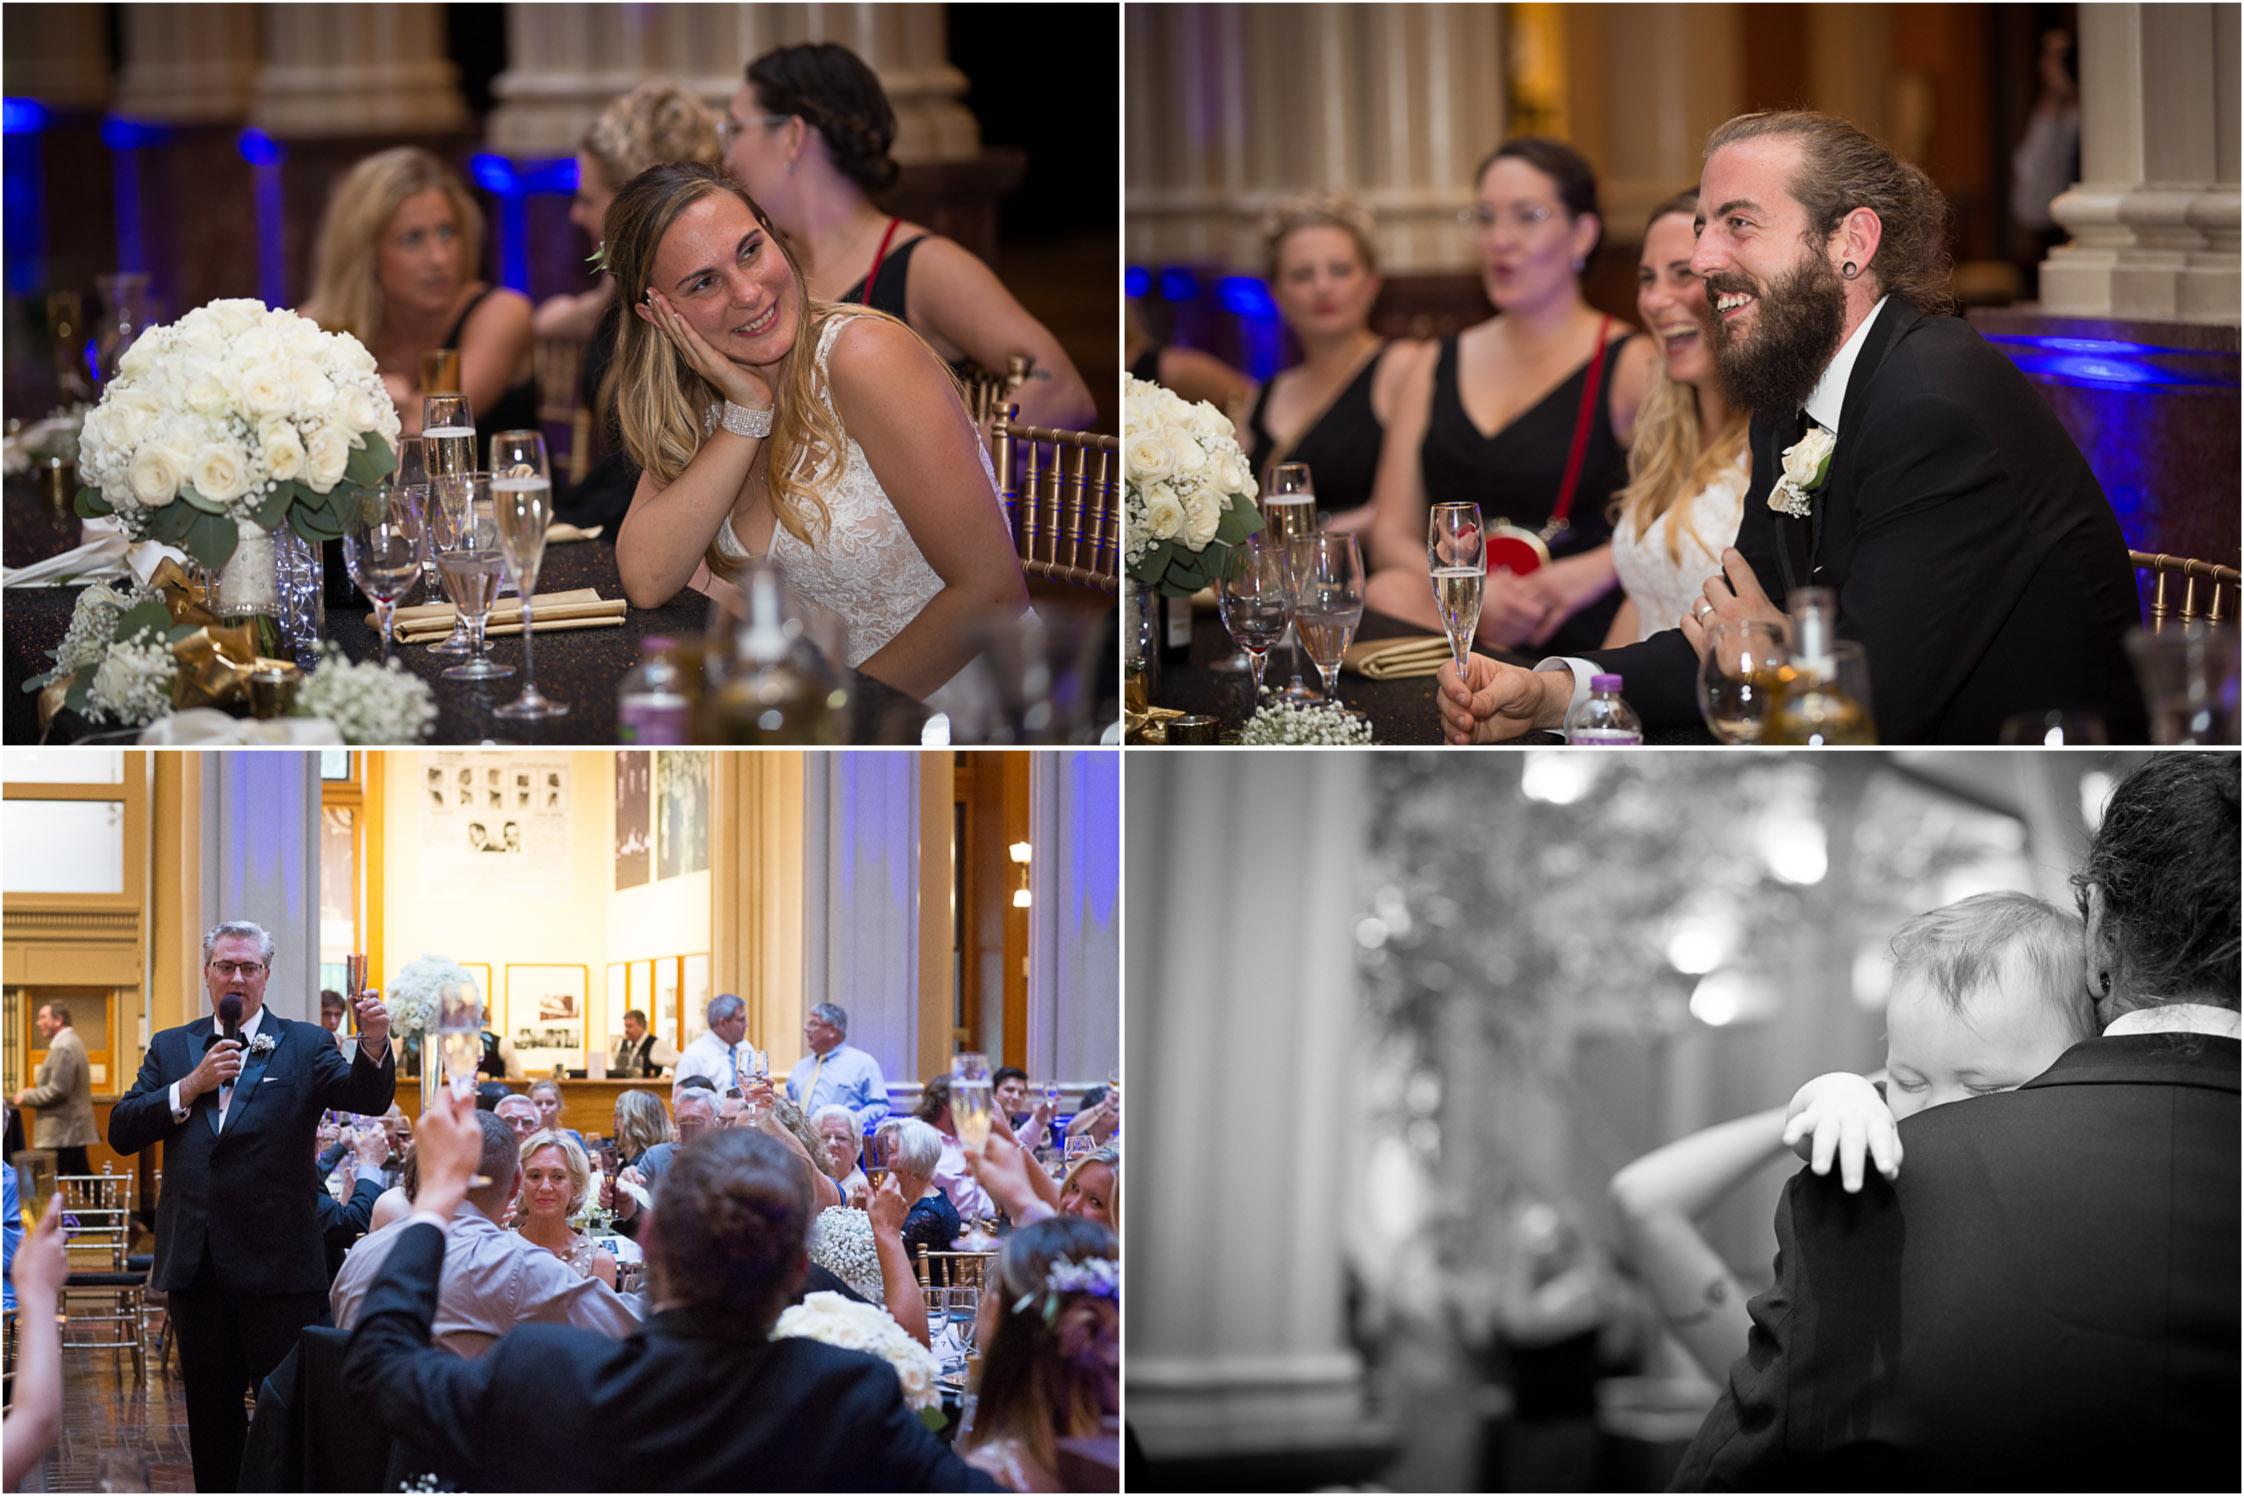 24-the-landmark-center-st-paul-mn-wedding-photographer-reception-fun-toasts-speeches-mahonen-photography.jpg